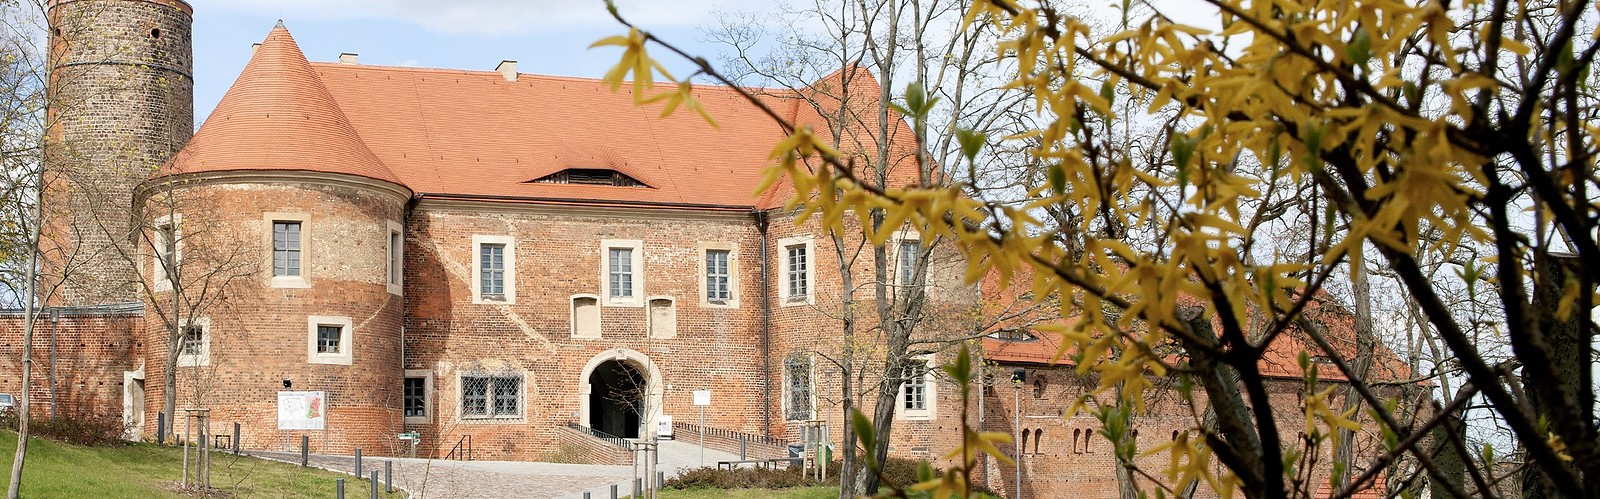 Burghotel Bad Belzig in Eisenhardt Castle, photo Burghotel Bad Belzig